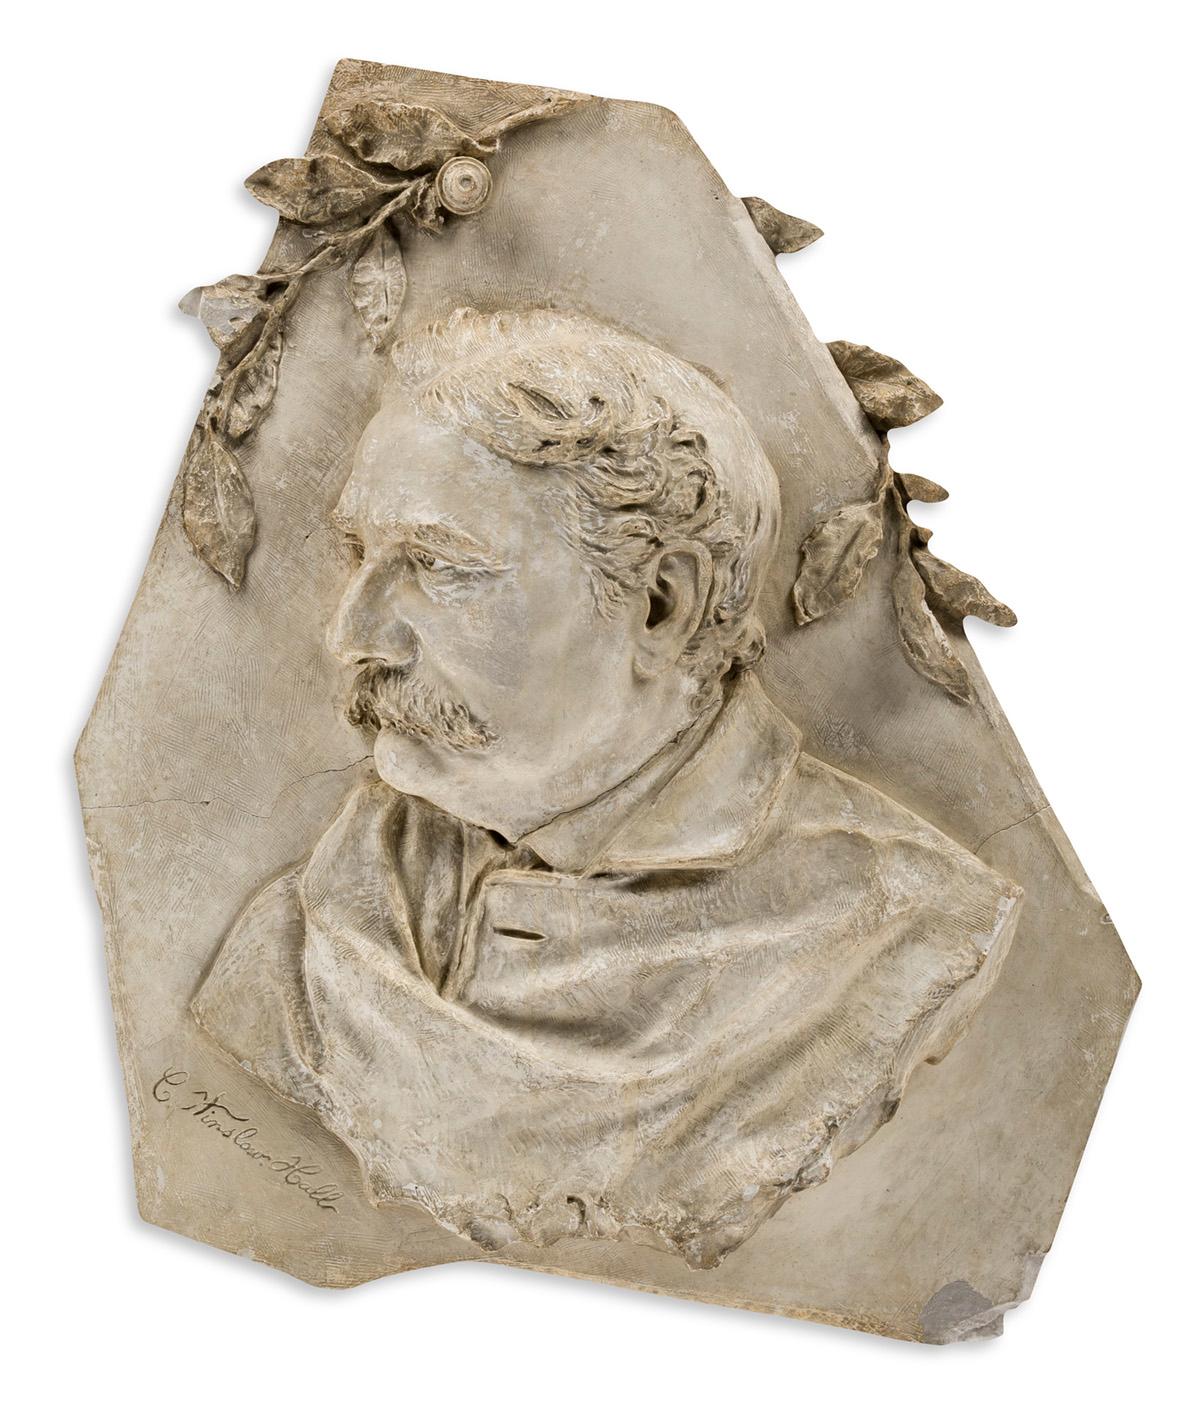 CHARLES WINSLOW HALL, (1860-1901) Portrait of Joseph Frank Currier